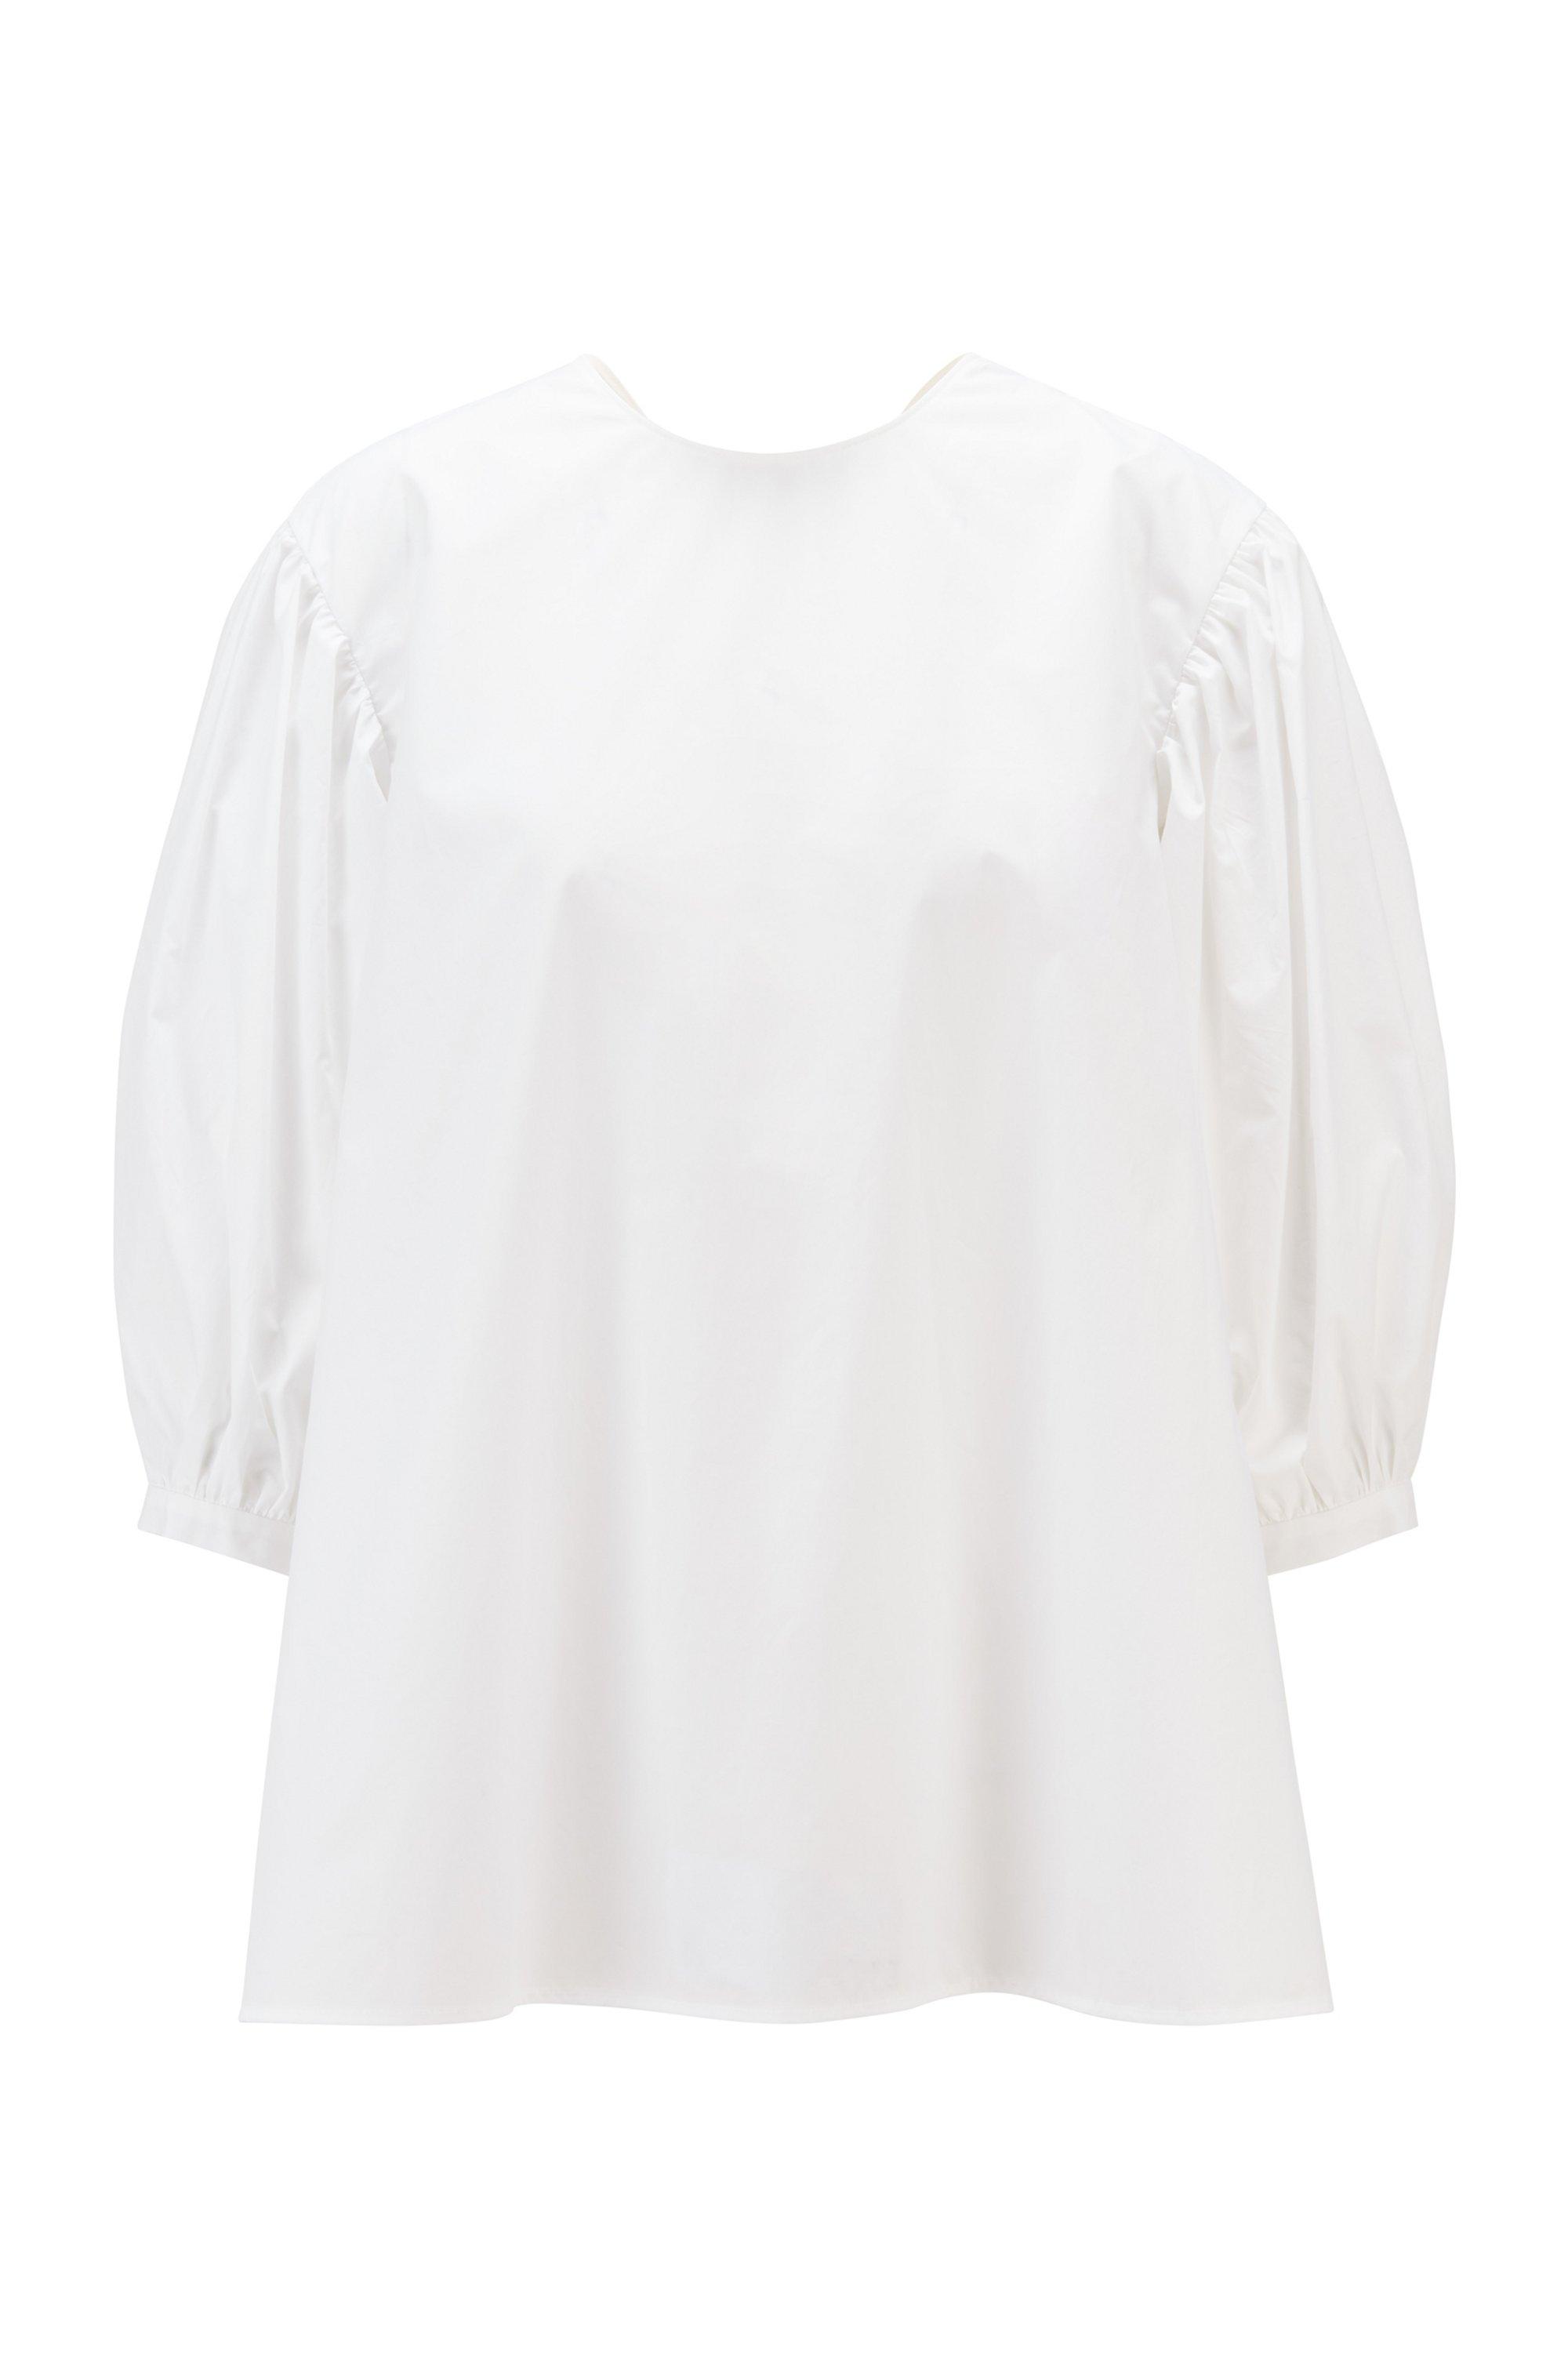 Cotton-poplin top with balloon sleeves, White